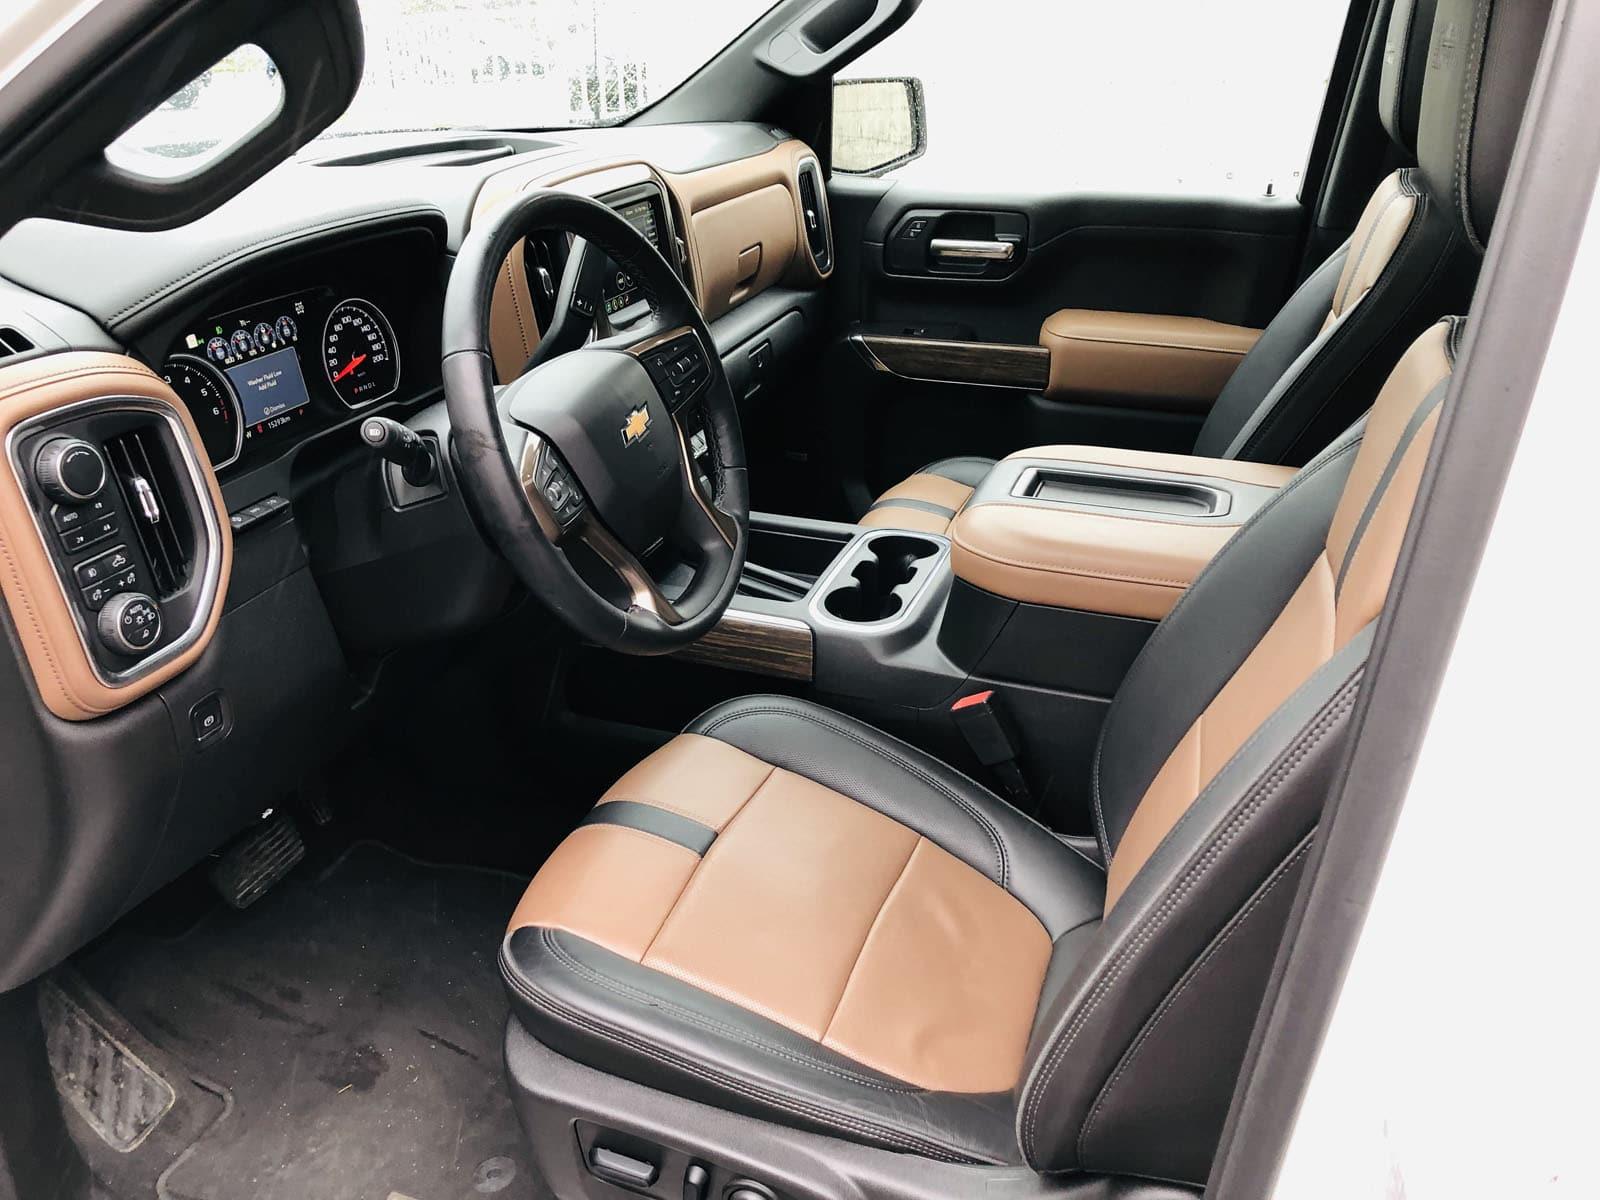 2019 Chevrolet Silverado 1500 - Photo: Matt St-Pierre